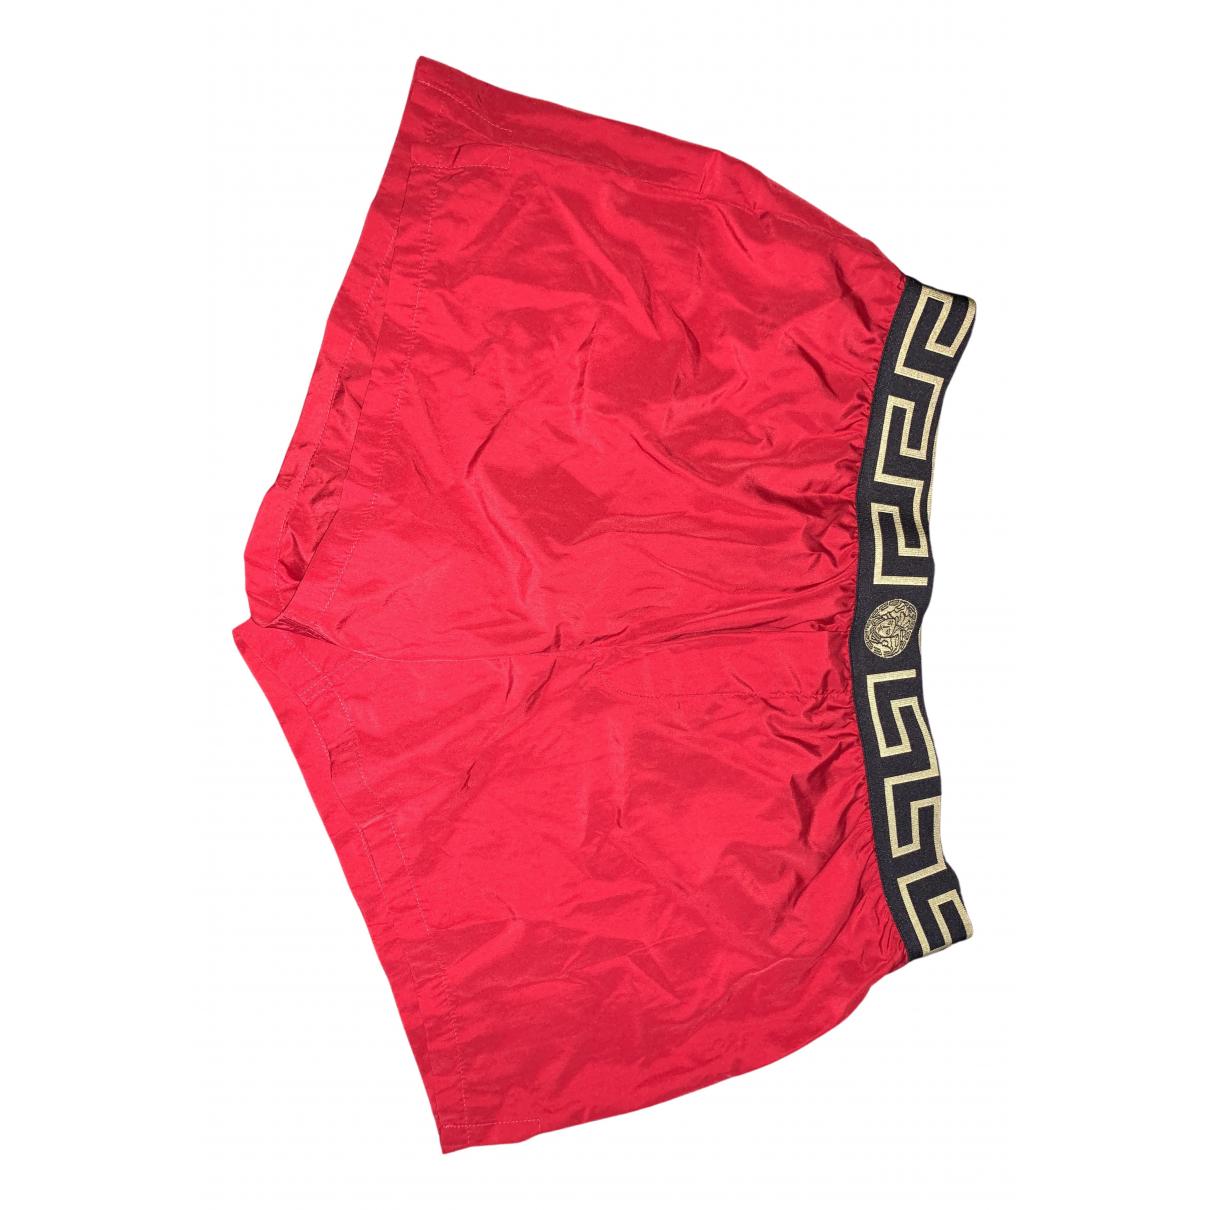 Versace N Red Swimwear for Men M International